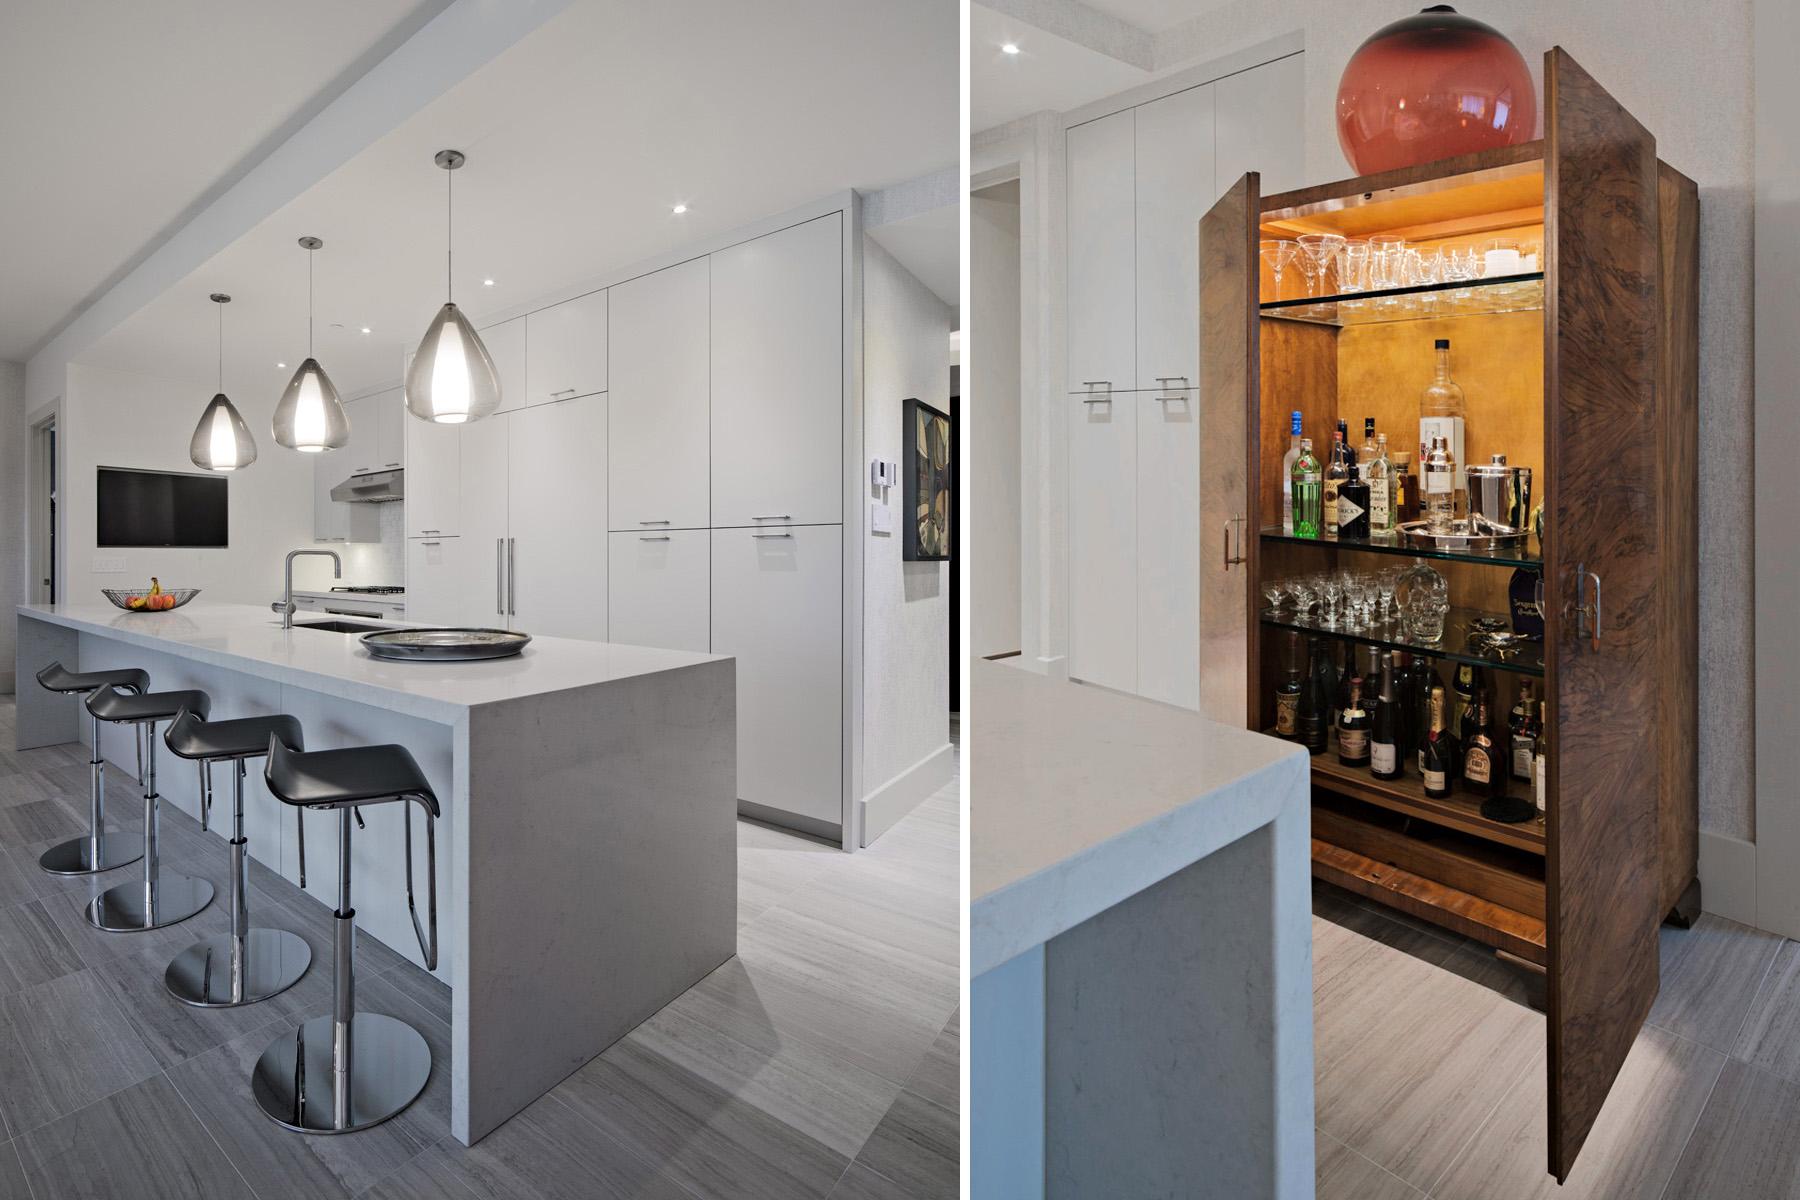 interiors-photography-westmount-condo-Jeffrey-Lamb-005